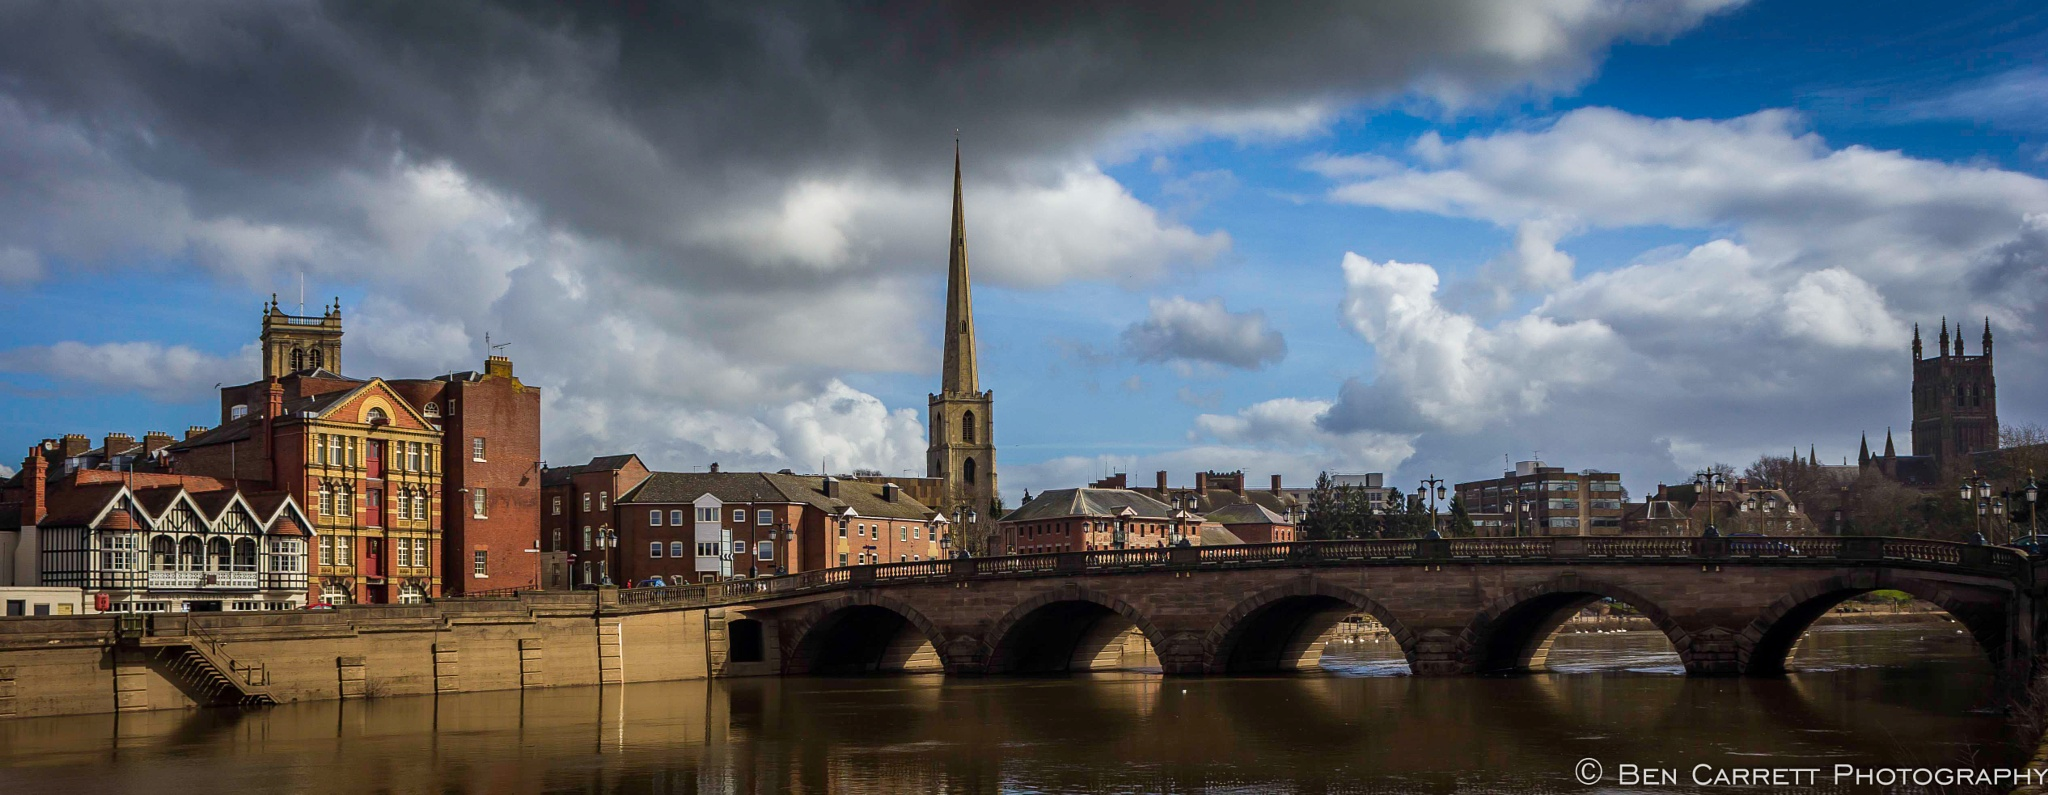 River View by bencarrett